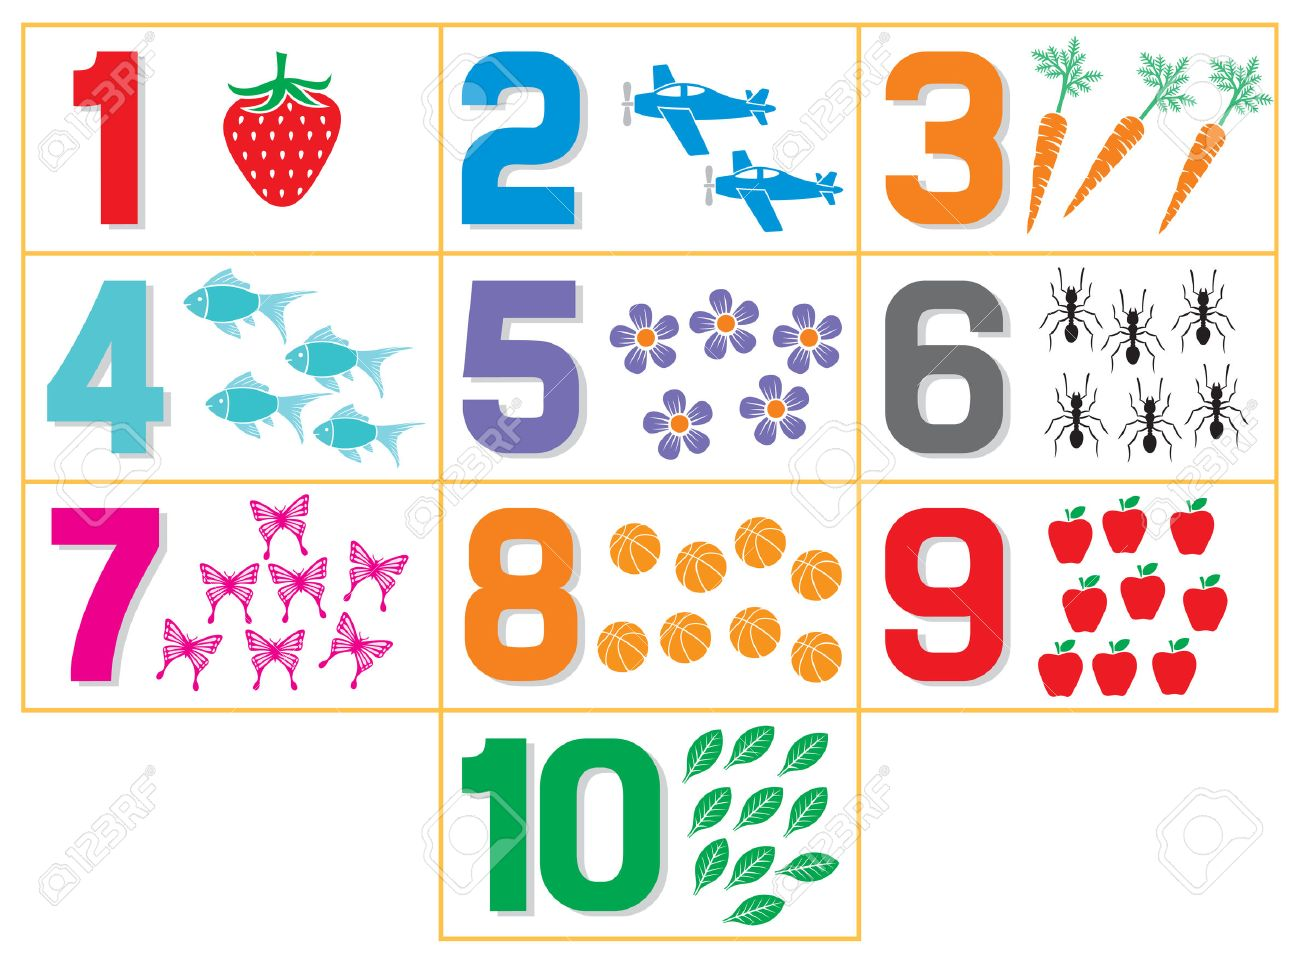 worksheet. Learning Numbers. Drfanendo Worksheets for Elementary ...